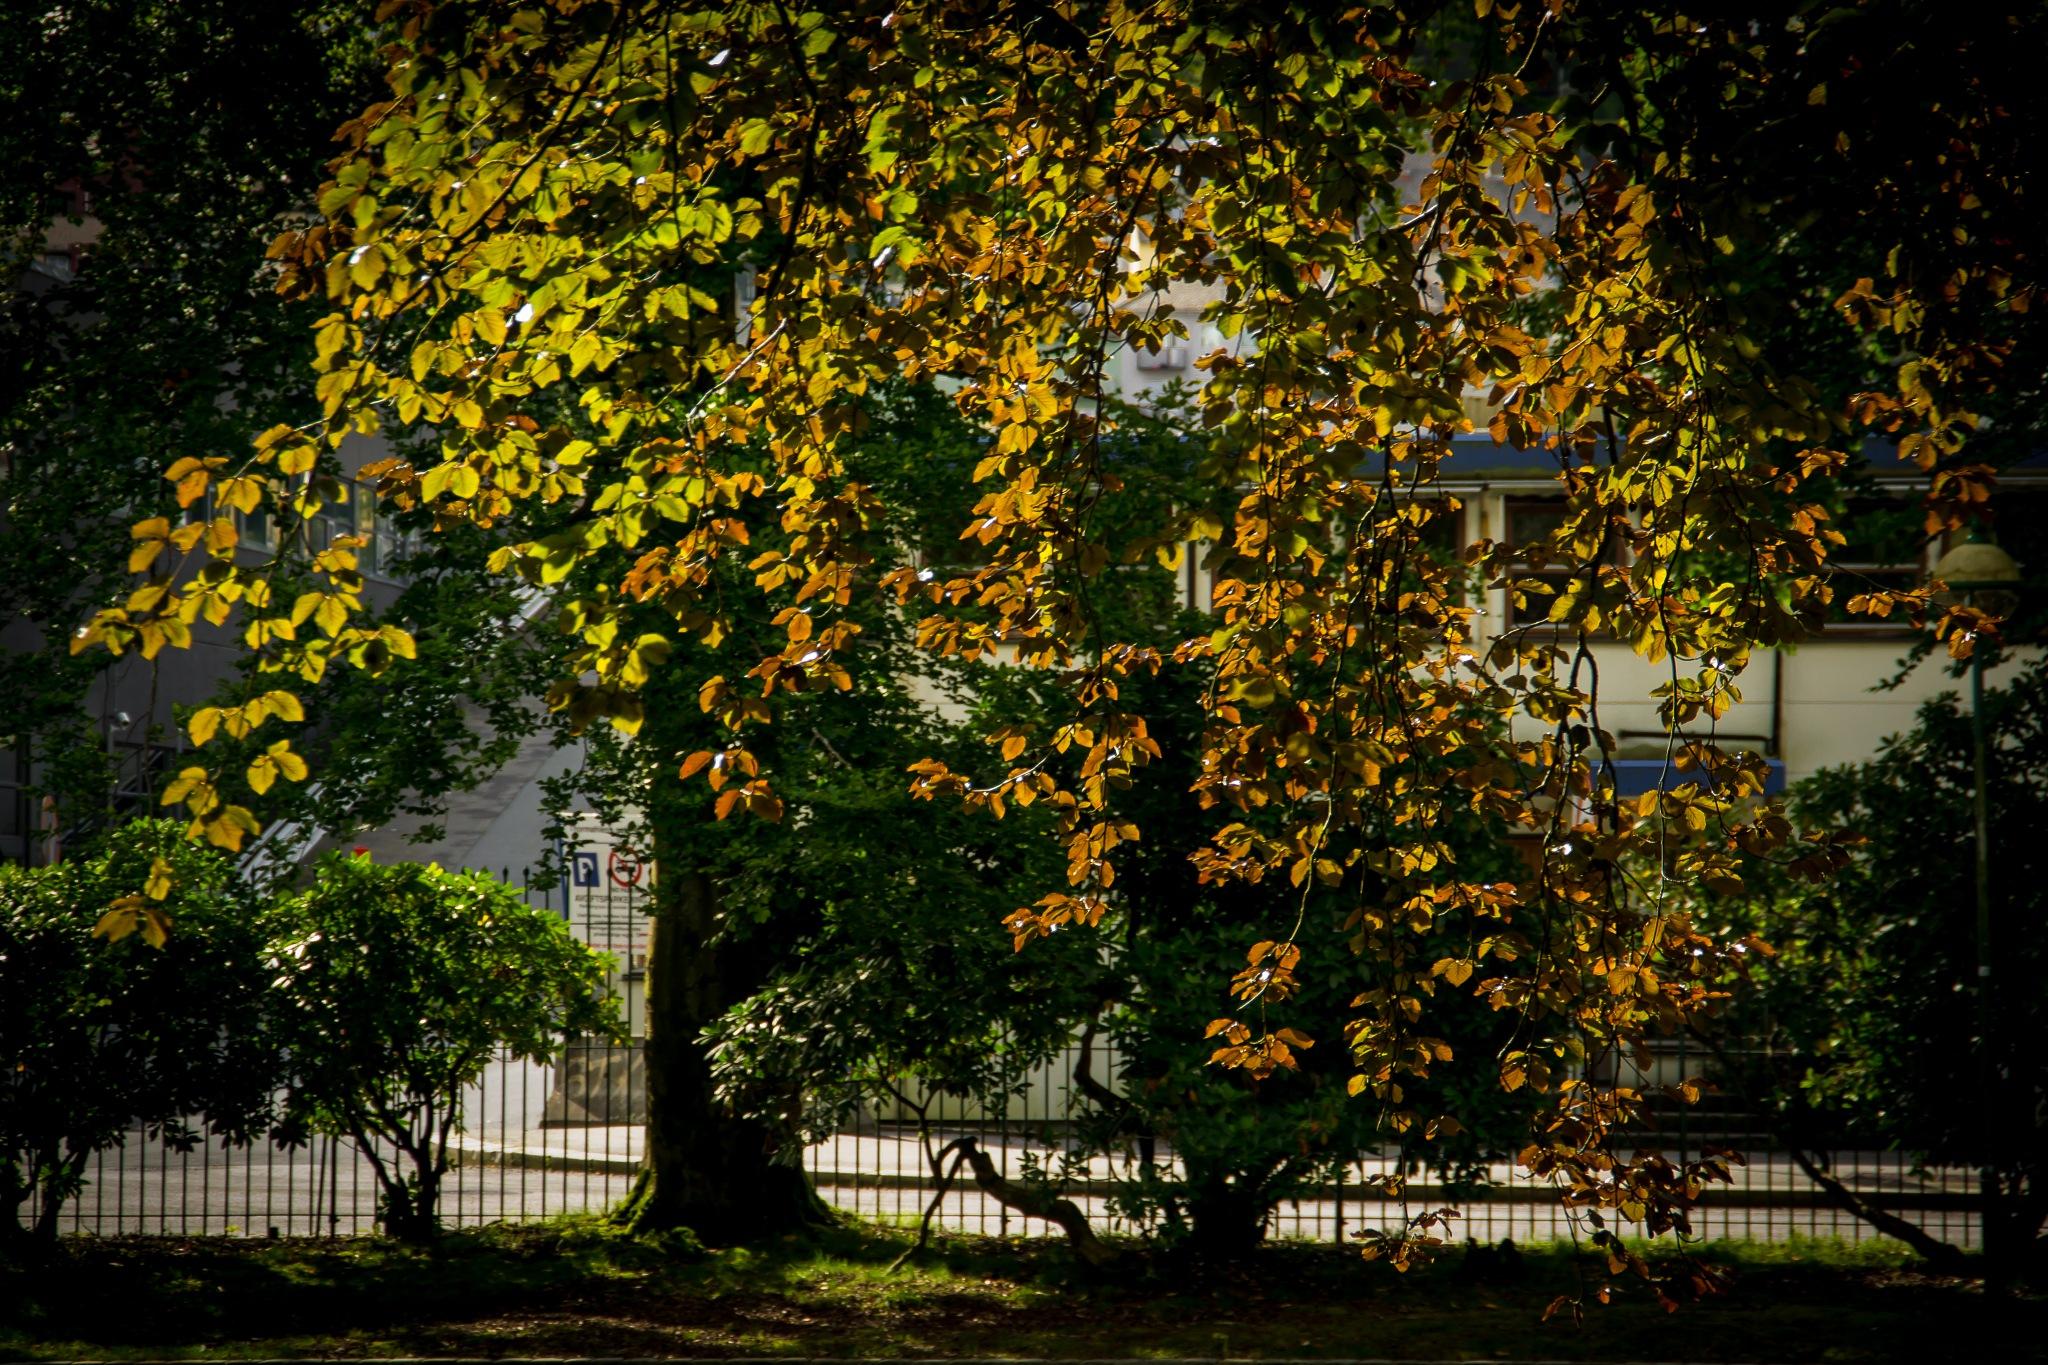 Autumn Arrives by MjollnirMacAlba